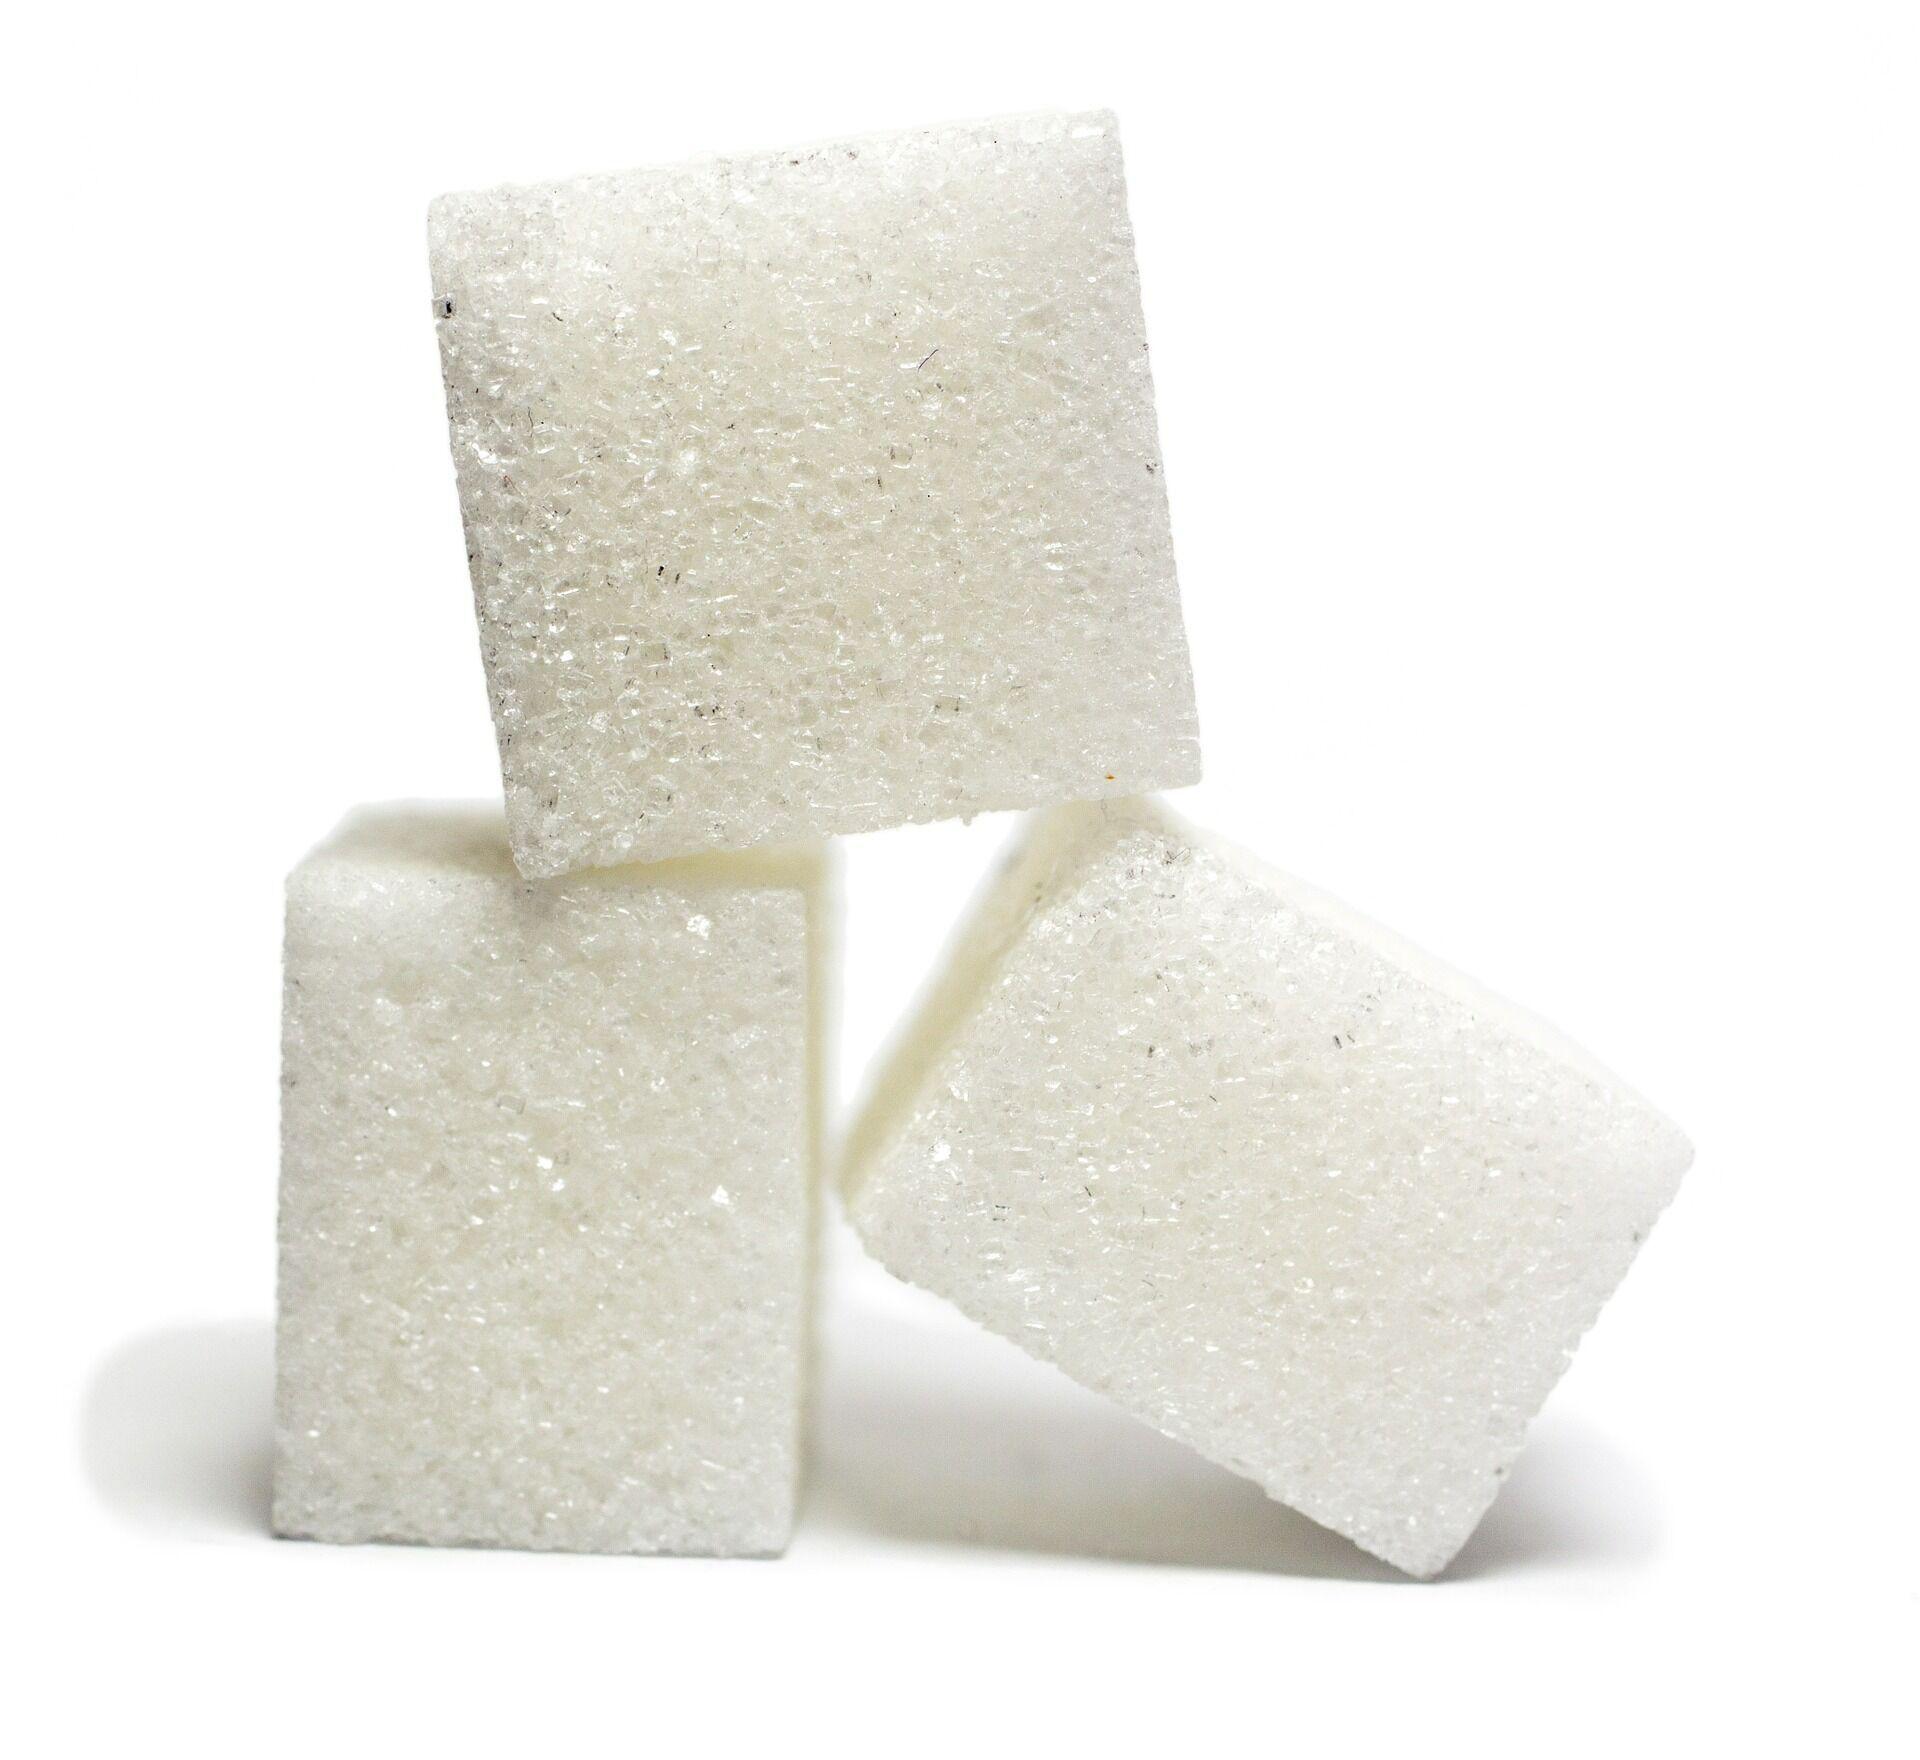 Количество сахара зависит от спелости фруктов